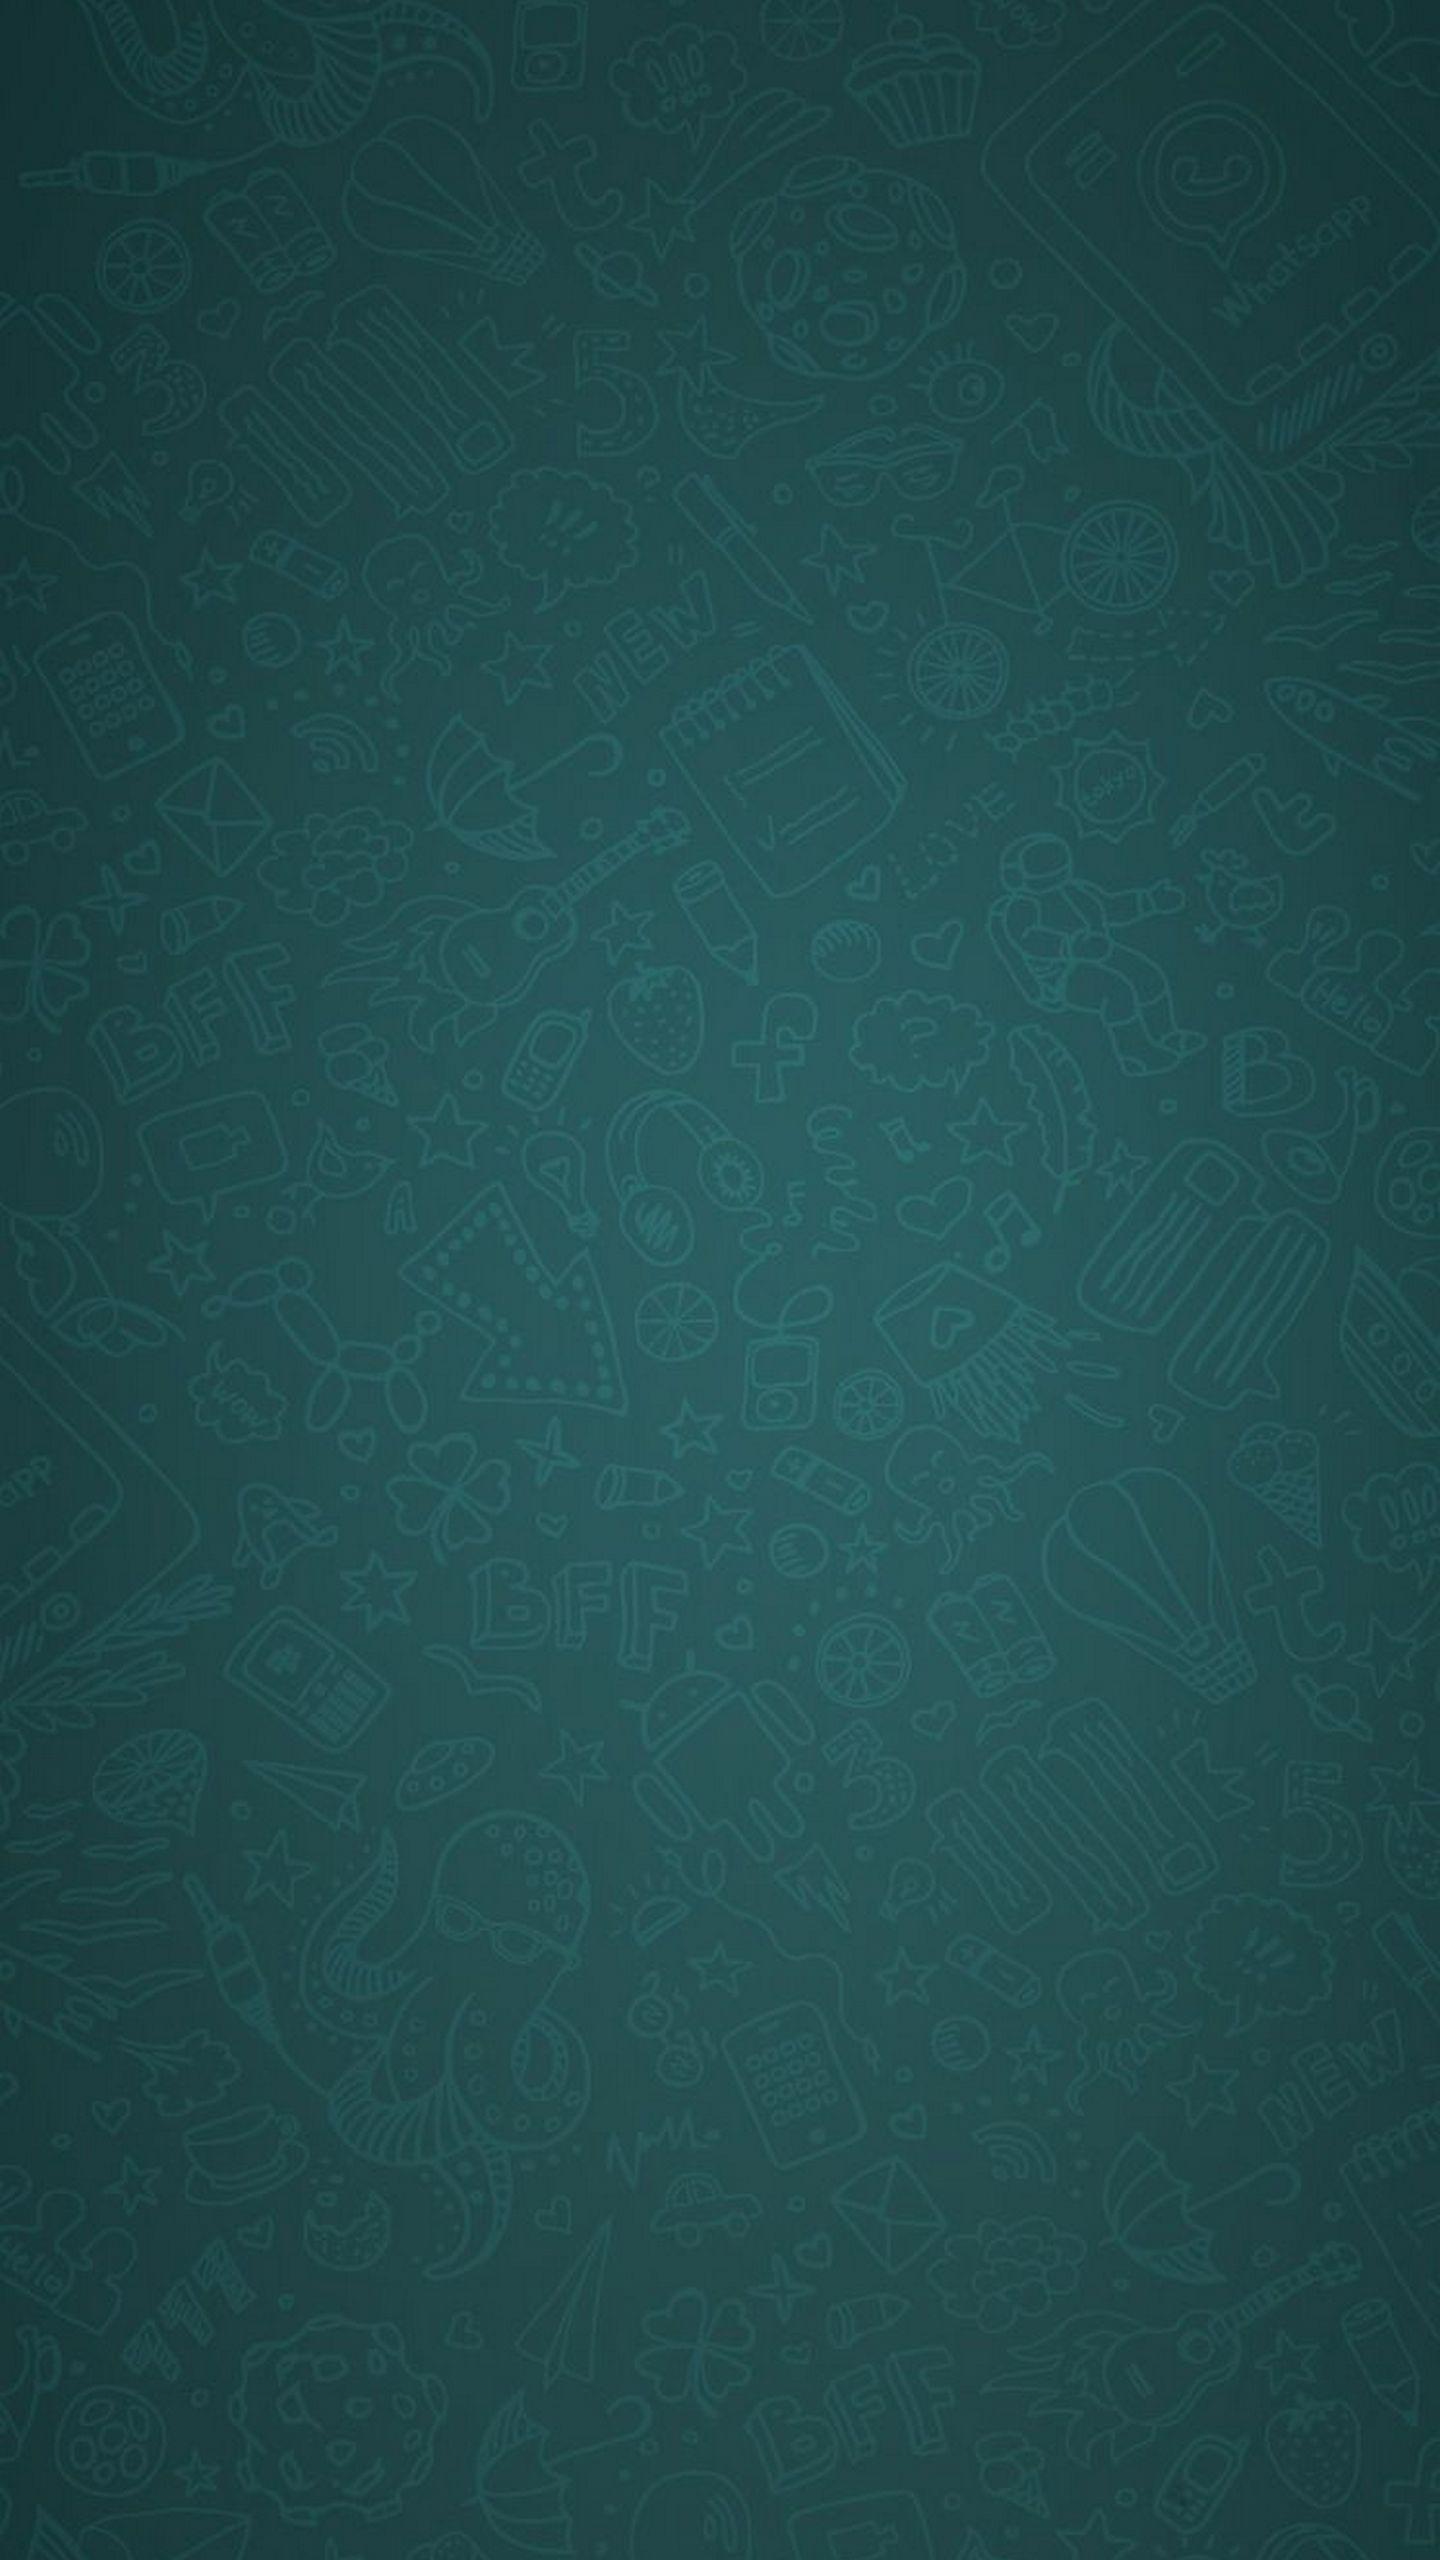 Whatsapp Wallpaper 109